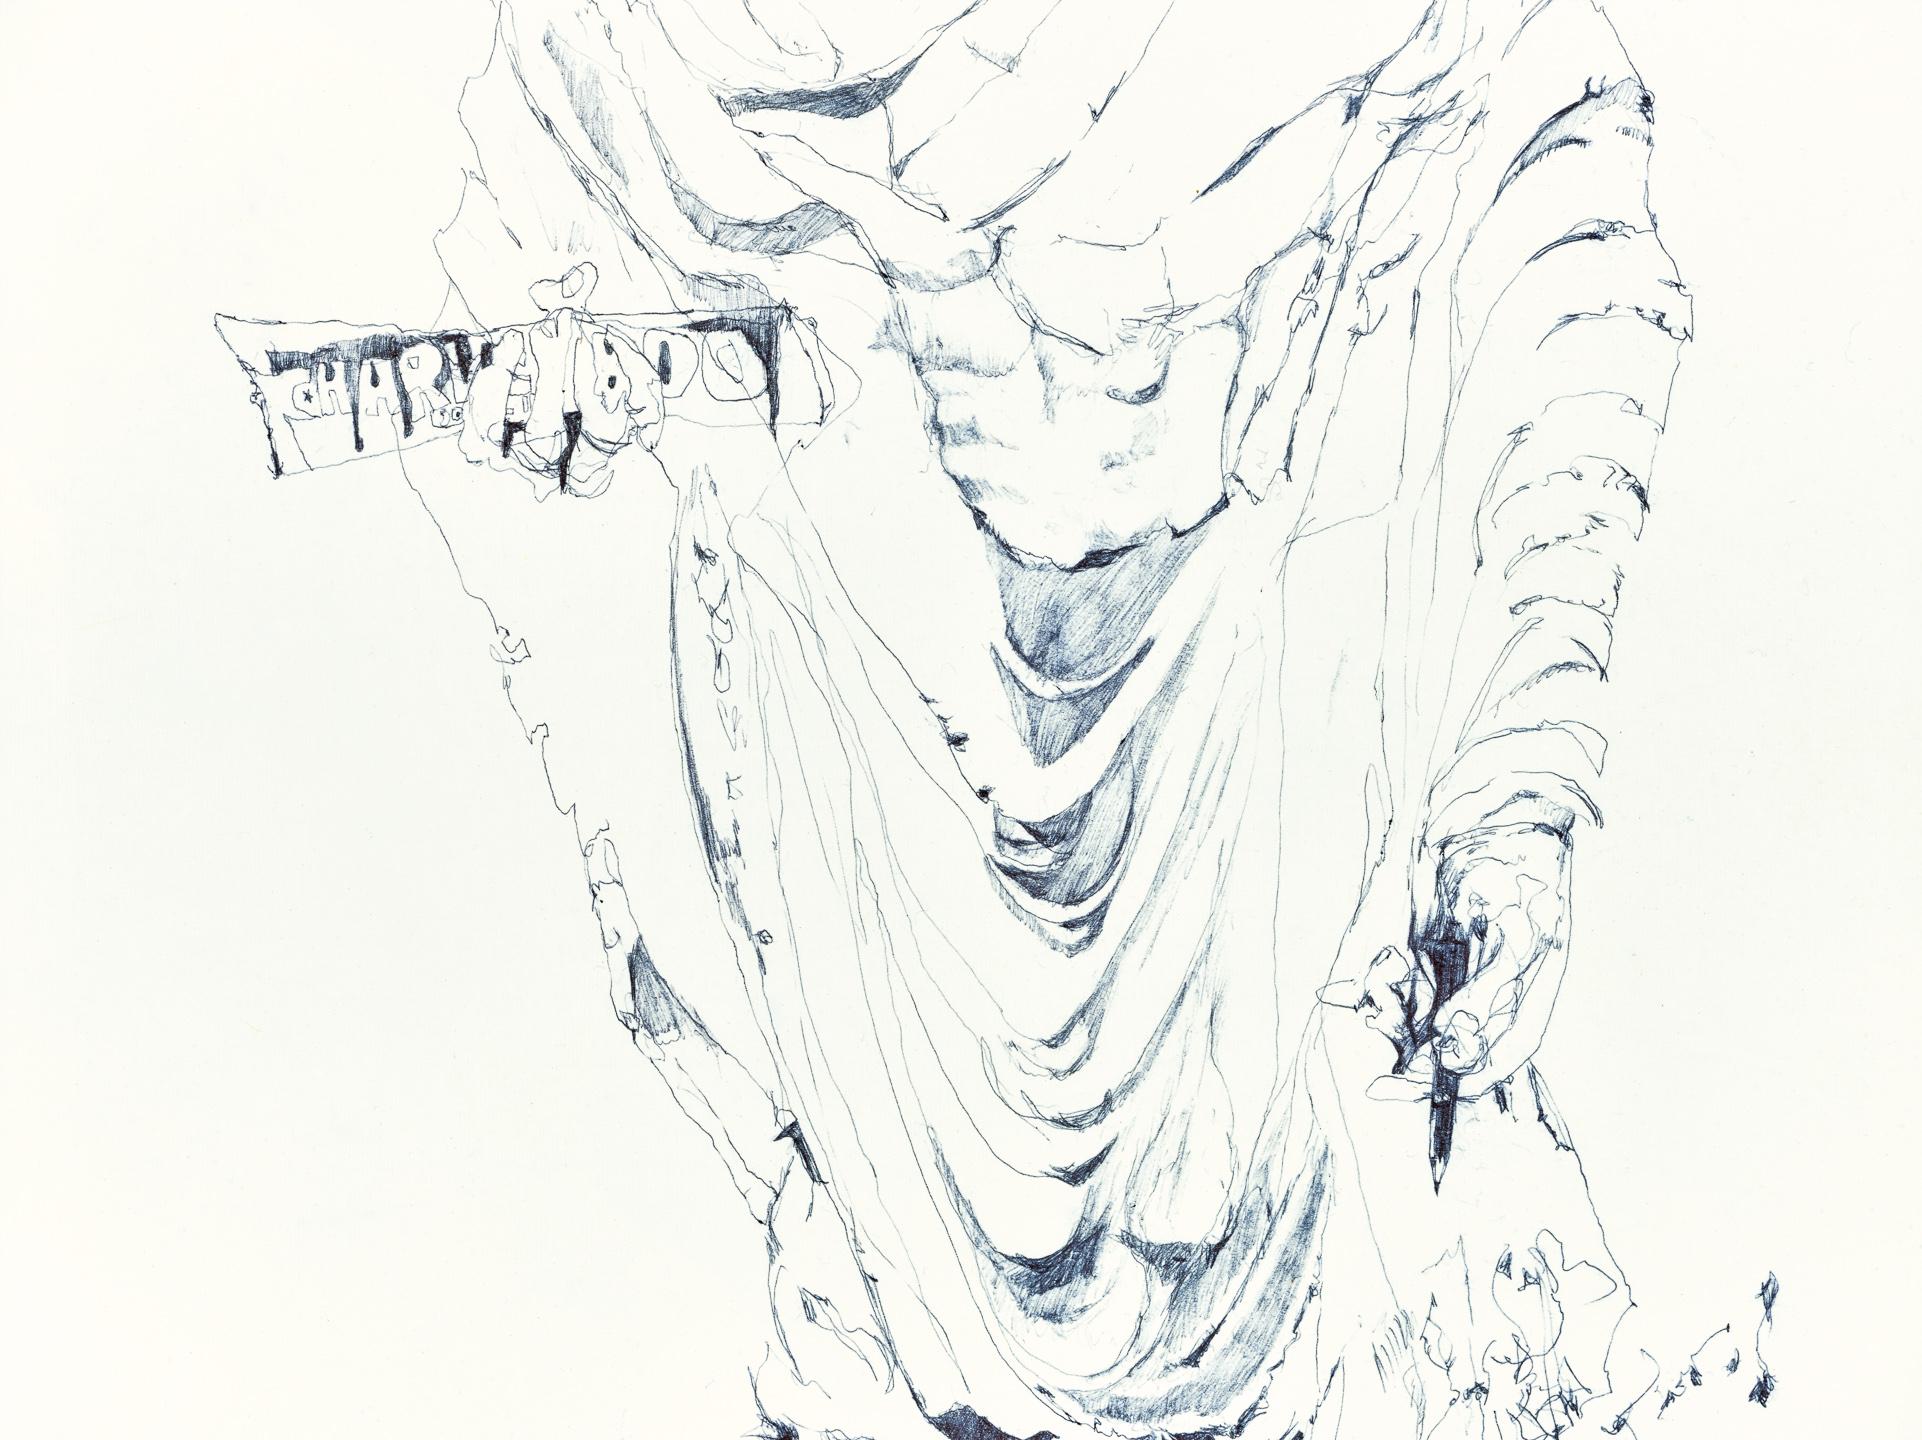 Dauntlessly - Charlie Buddha 1, detail 2